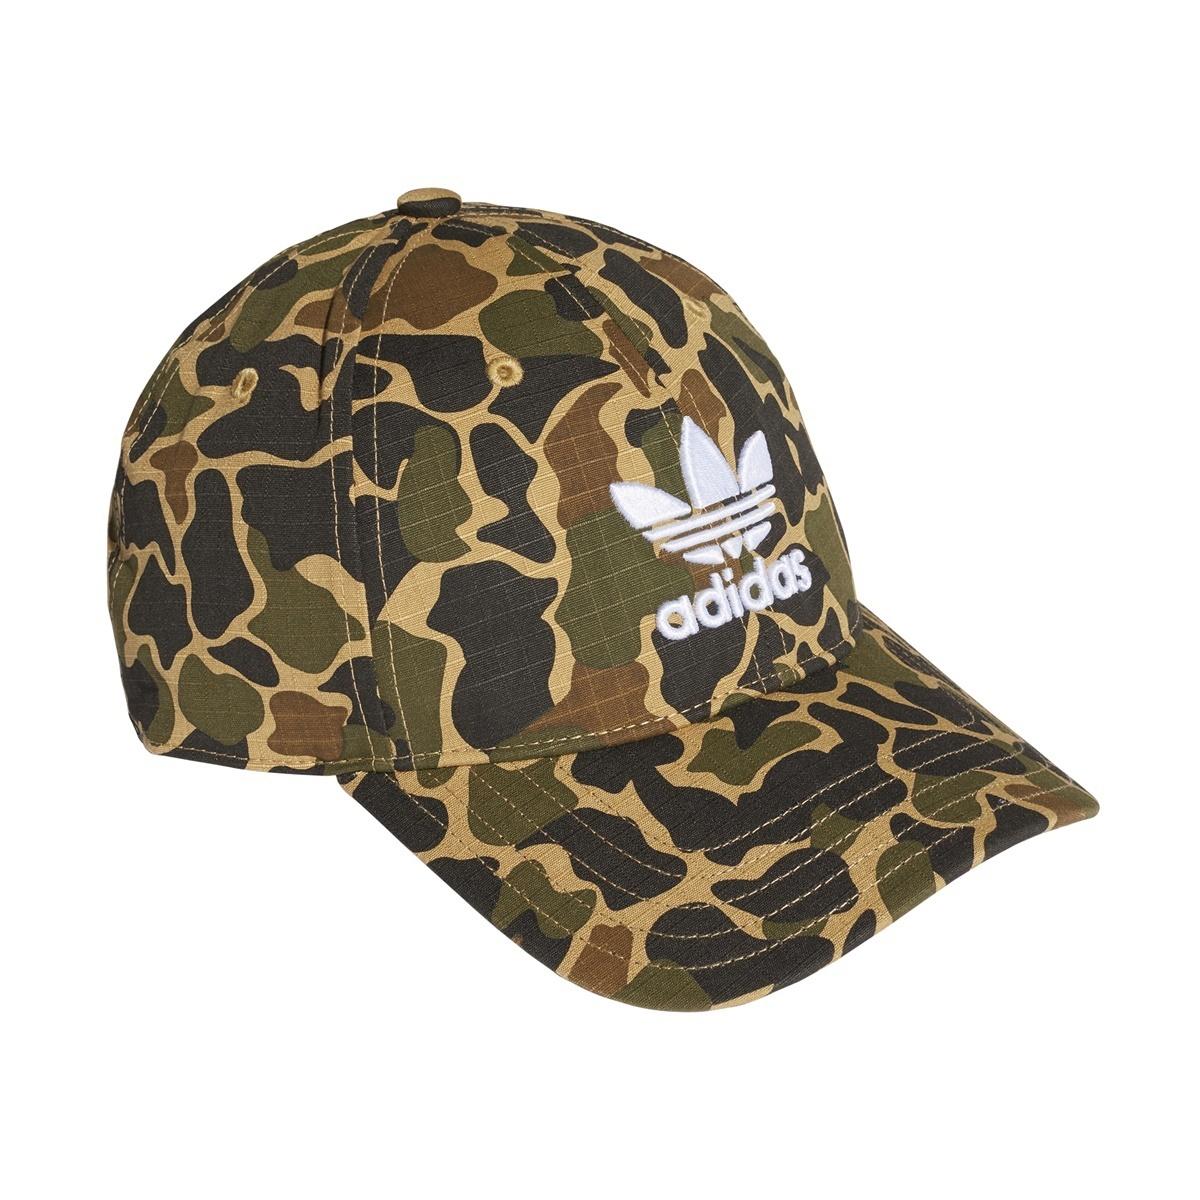 64163c51eaf Adidas Originals Camouflage Baseball Cap - manelsanchez.com